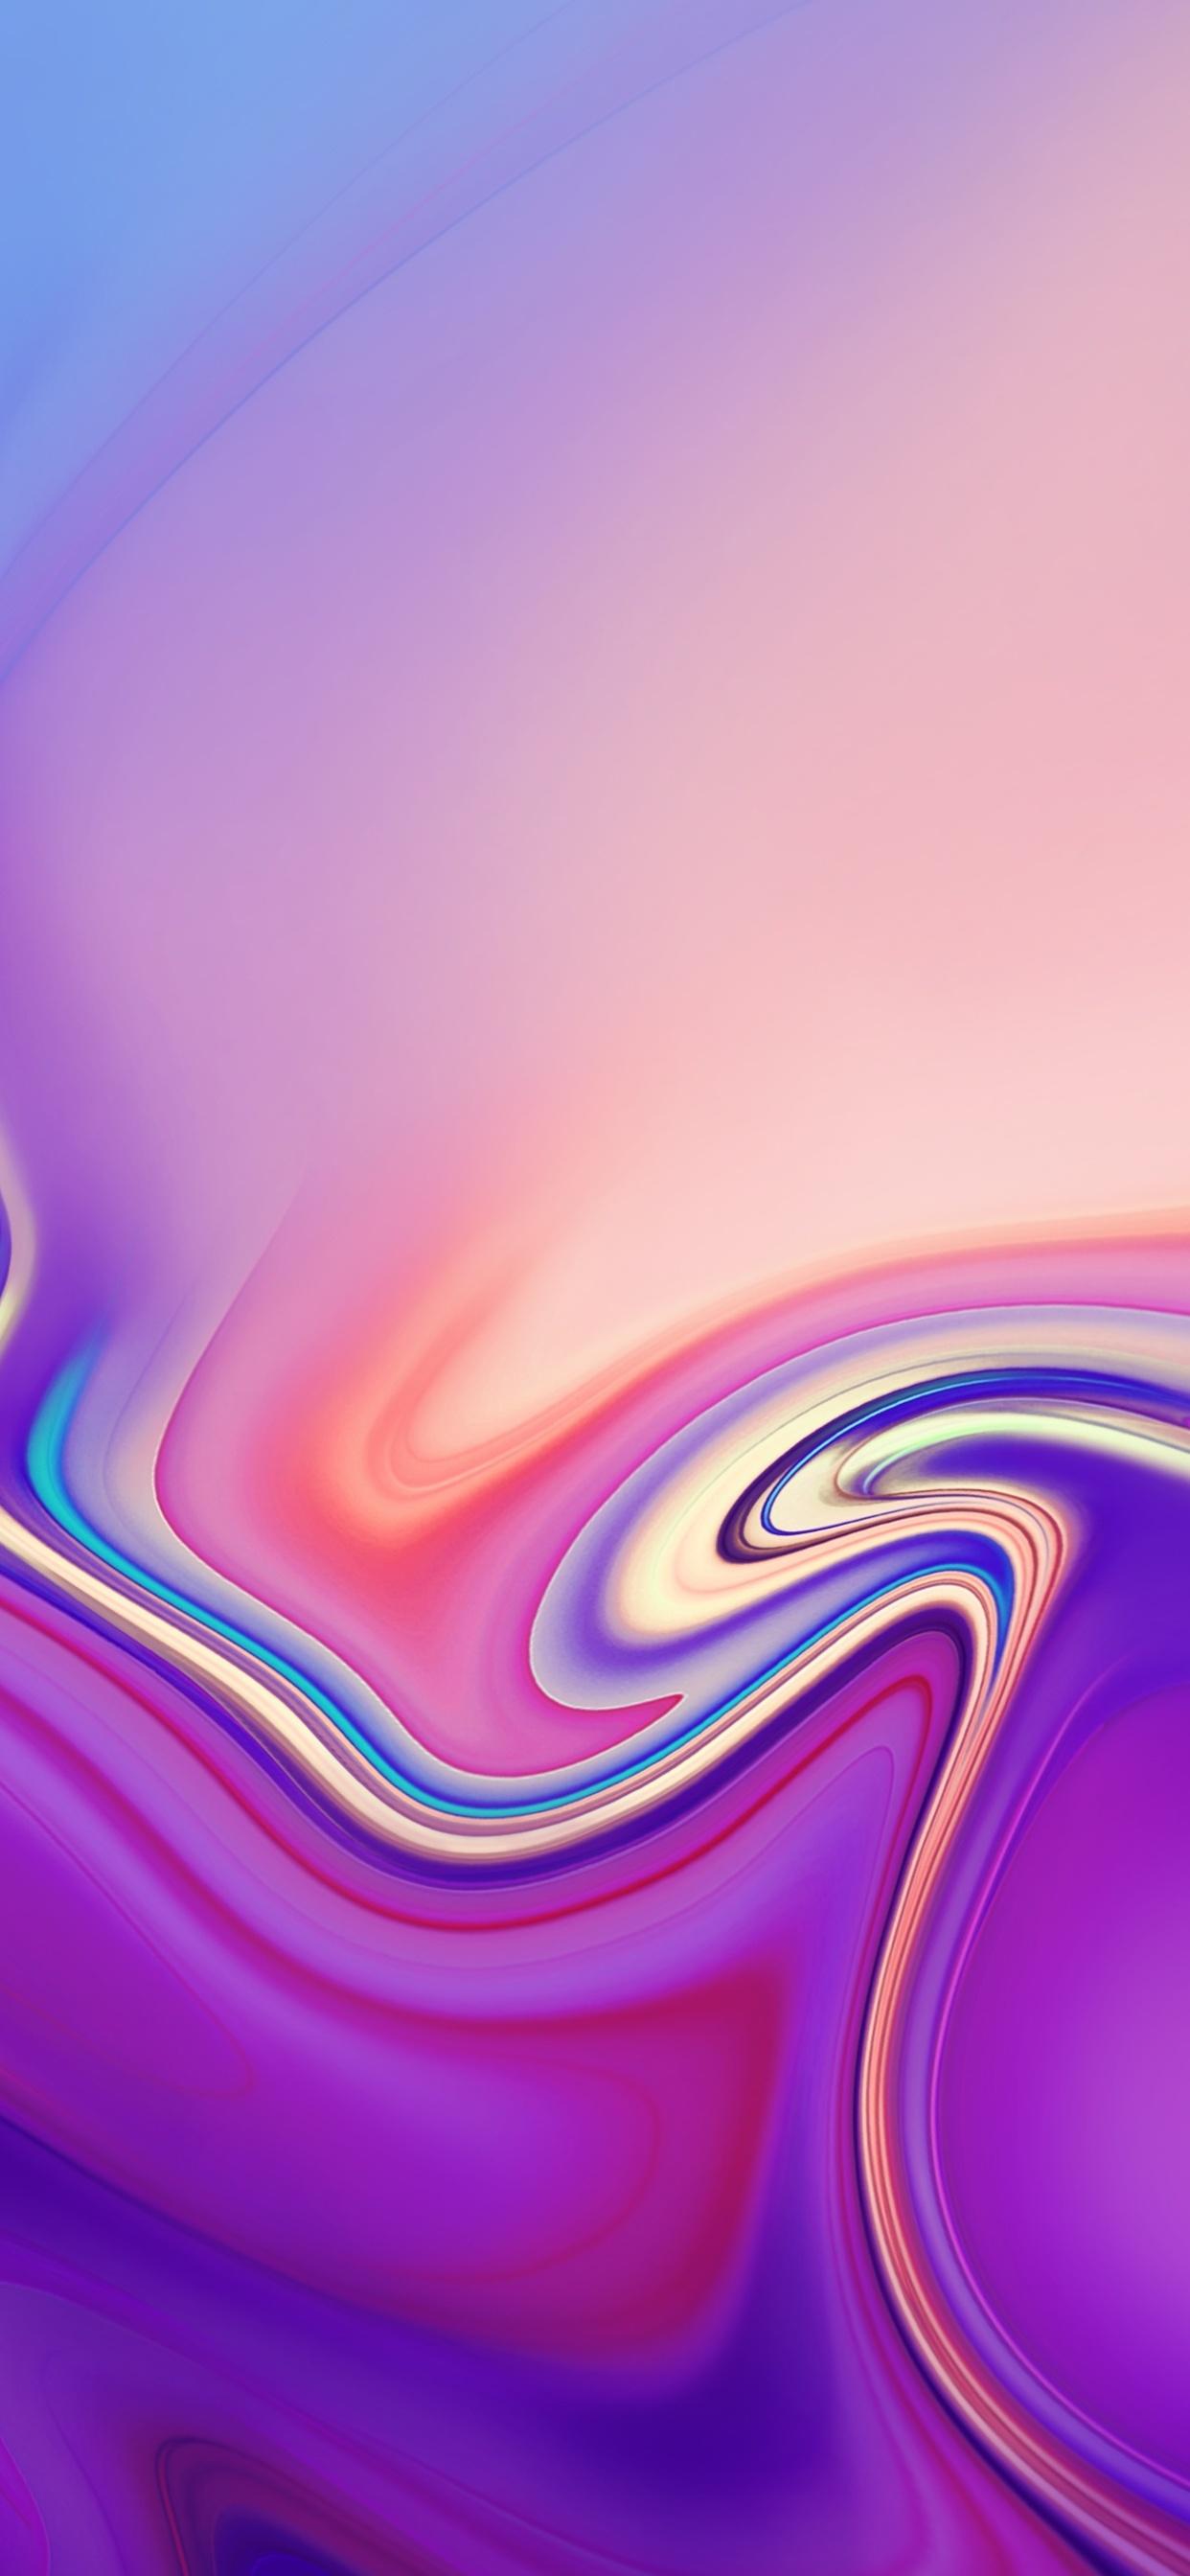 Iphone Xs Stock Wallpaper Hd Fitrini S Wallpaper